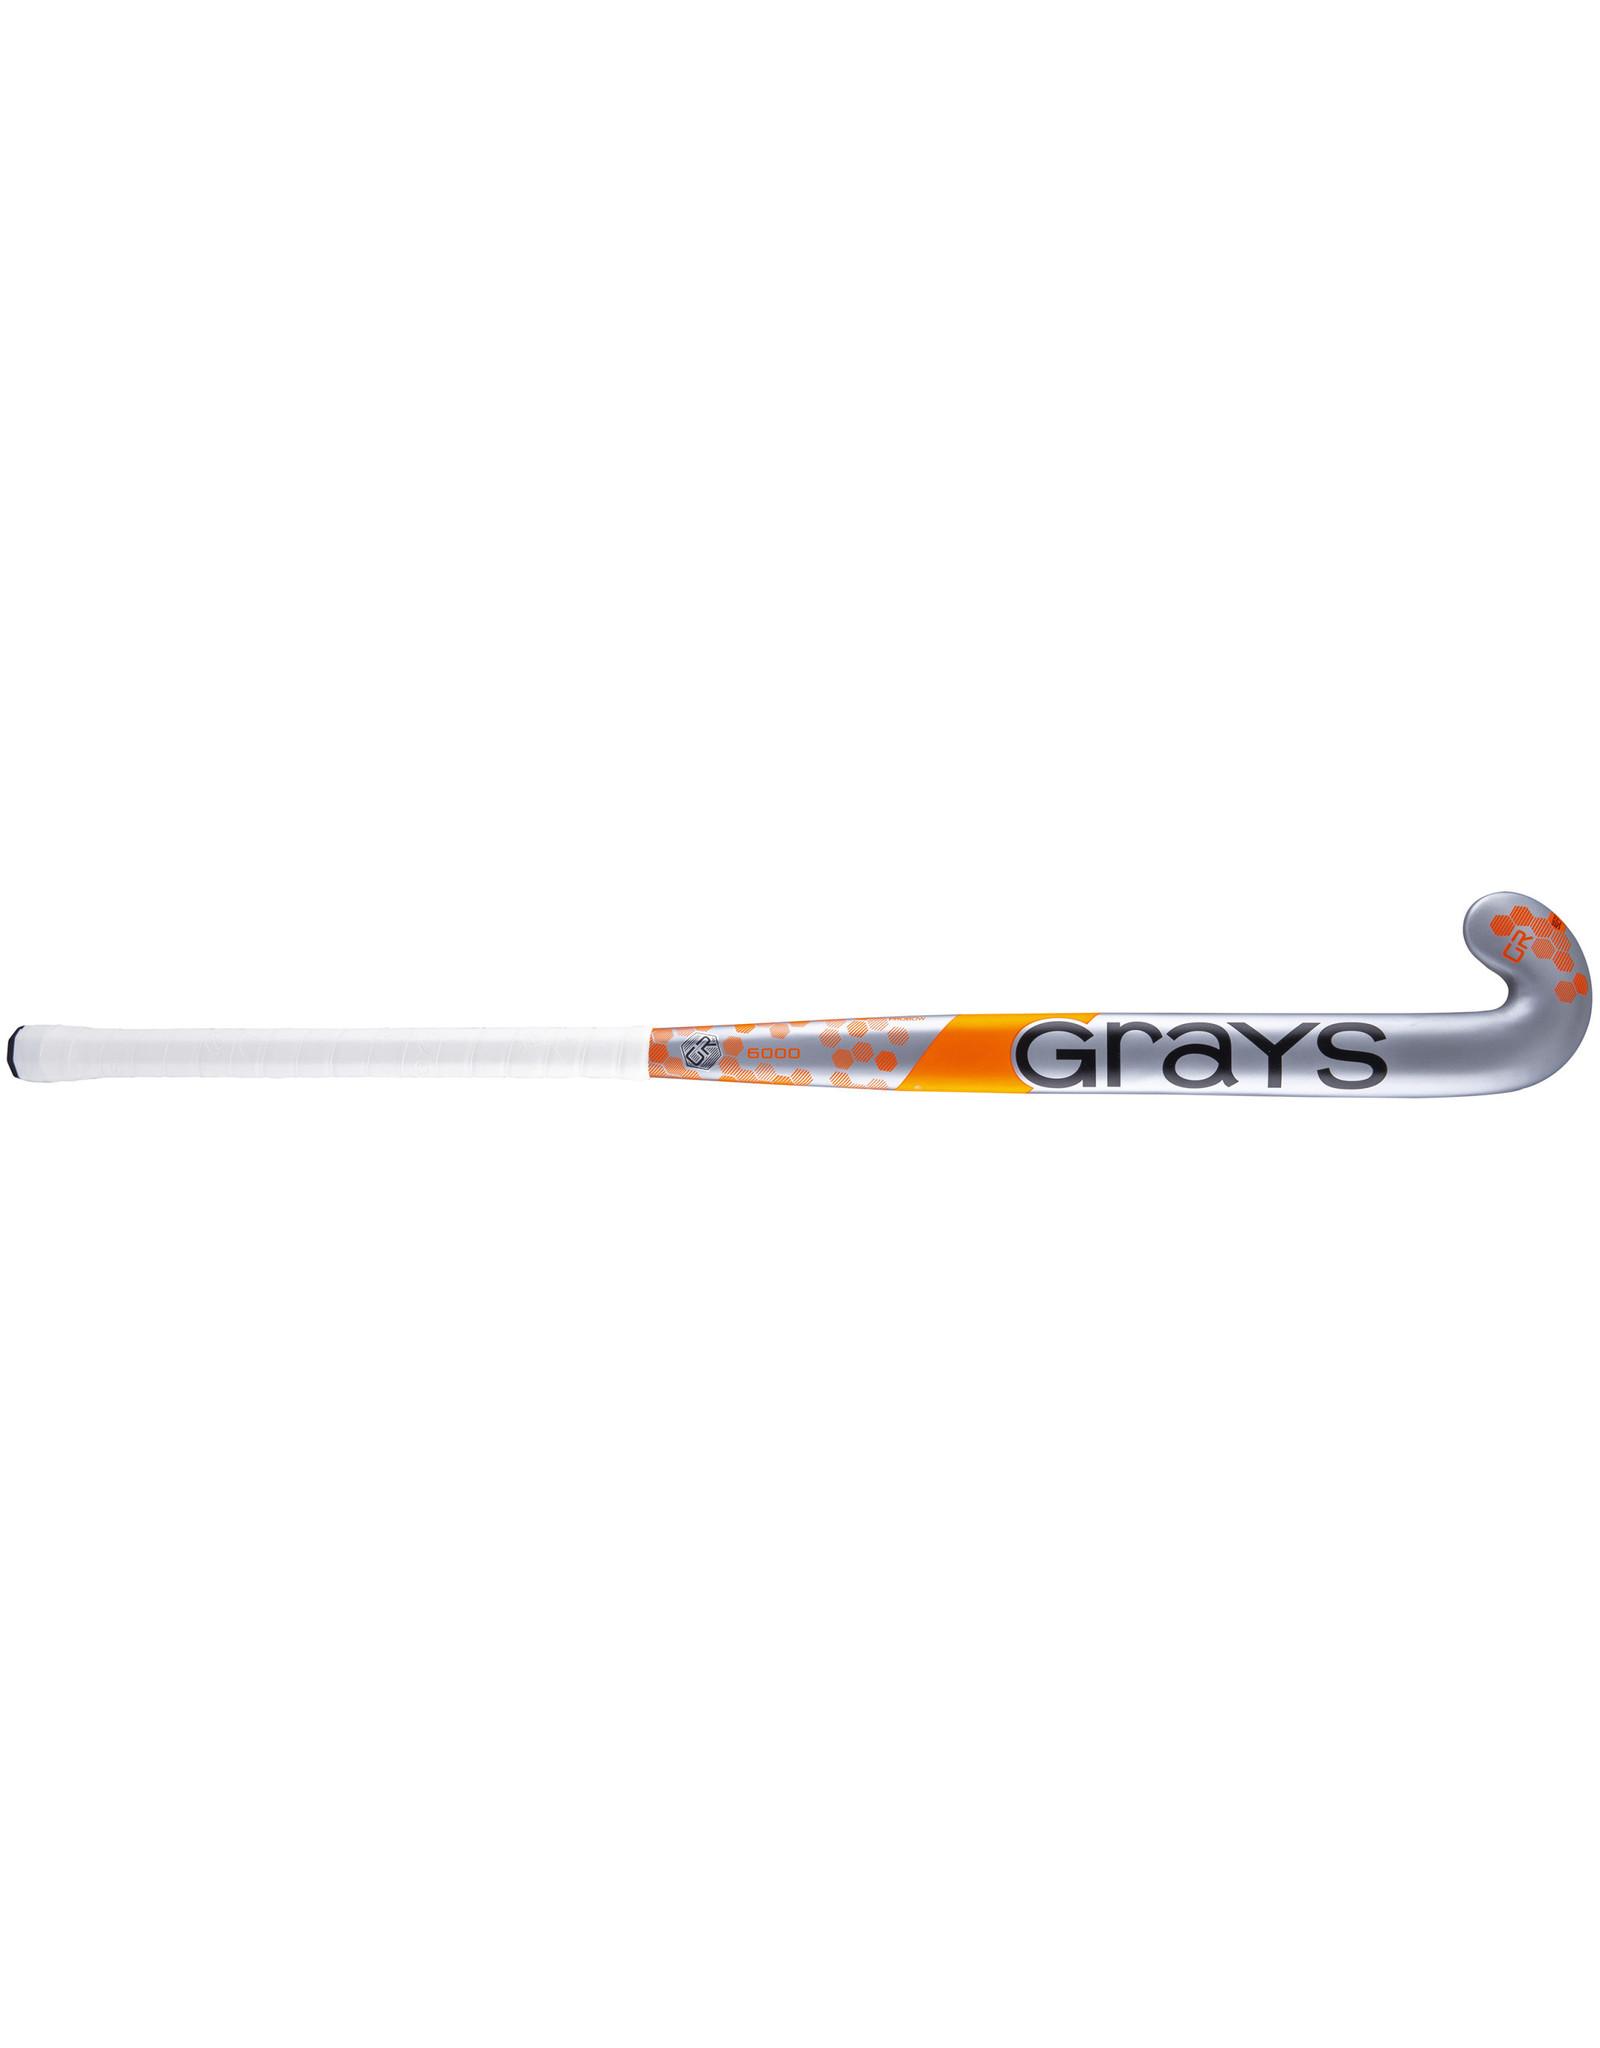 Grays STK GR6000 PB MC